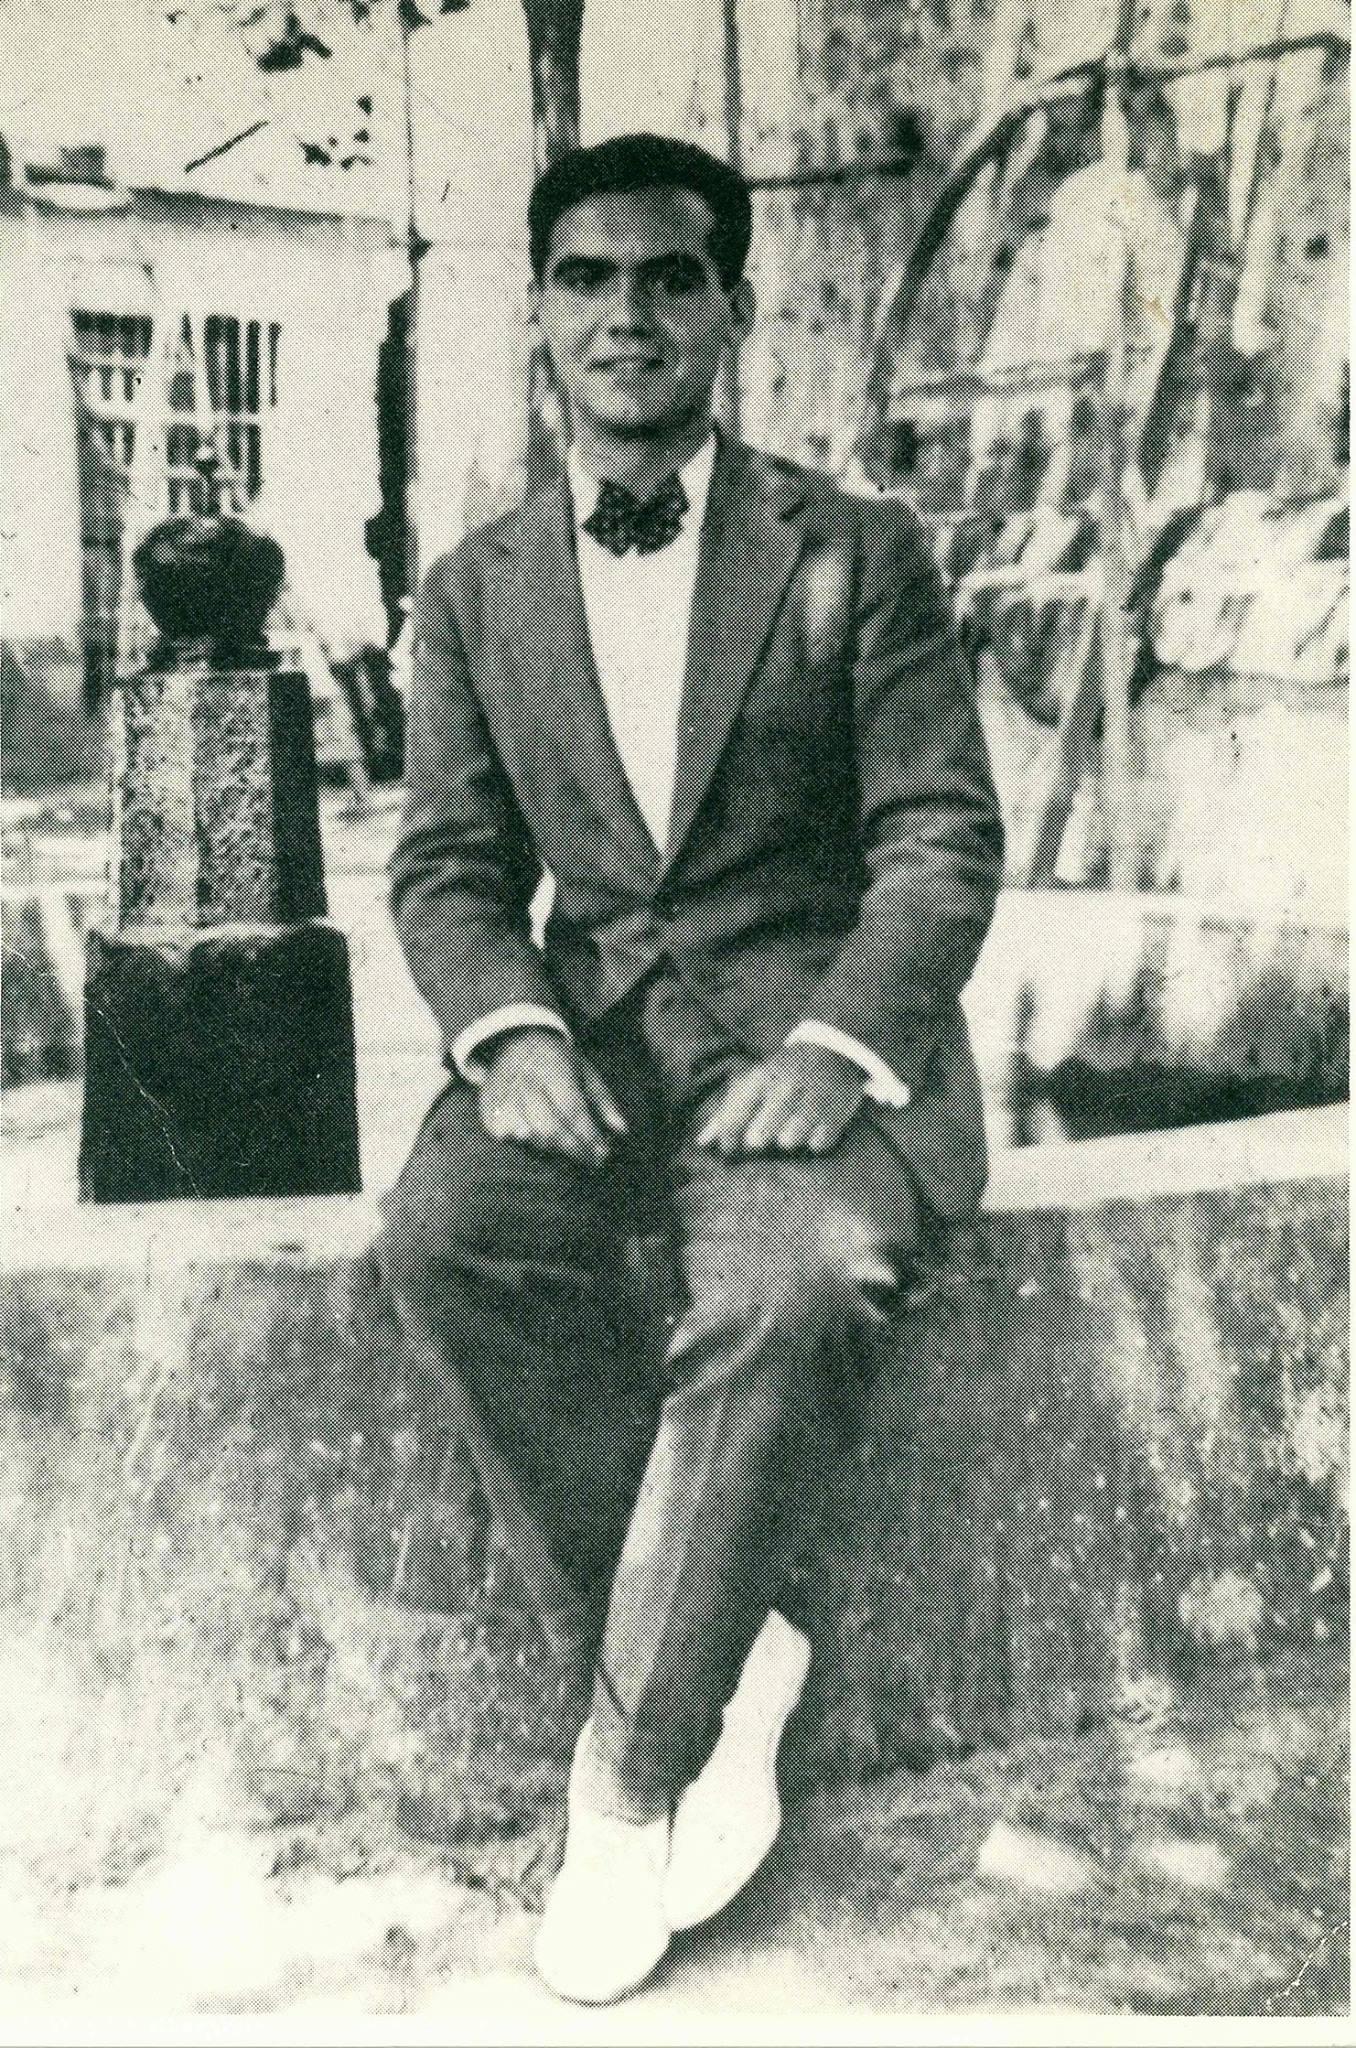 Chi era Federico García Lorca